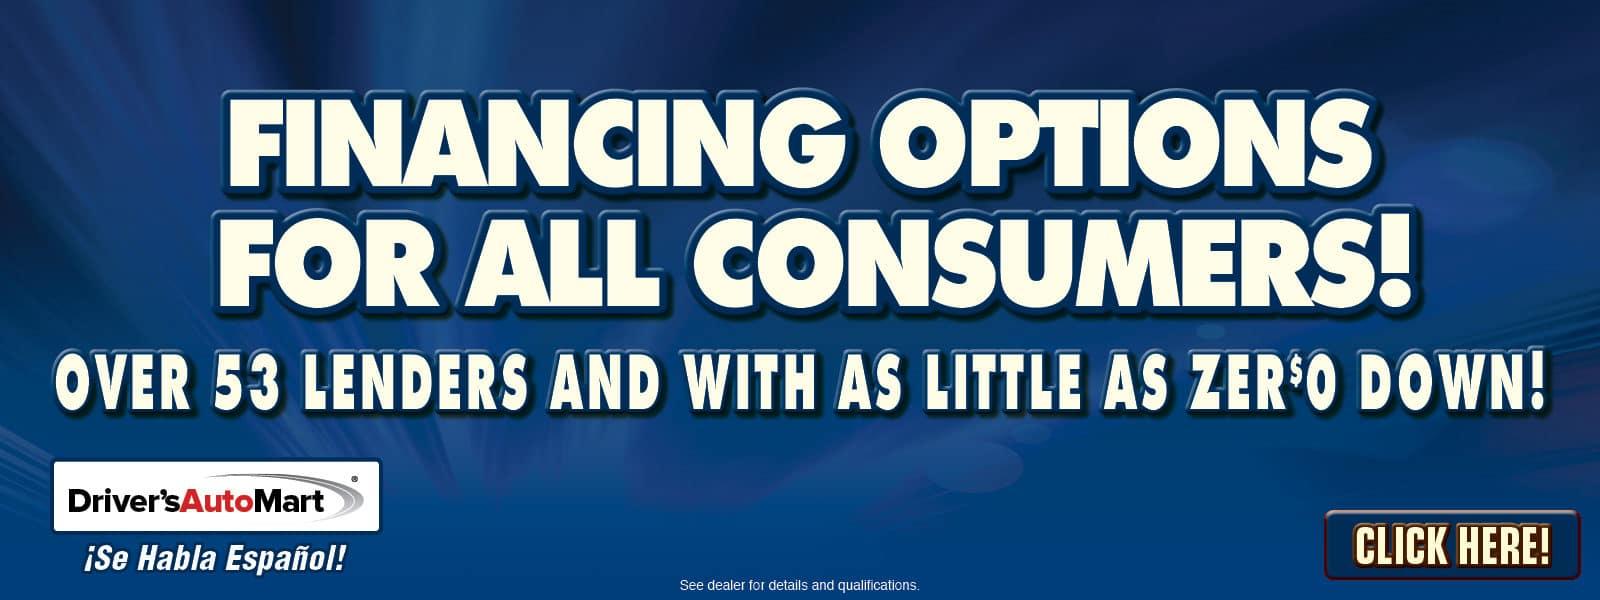 Financing Options!